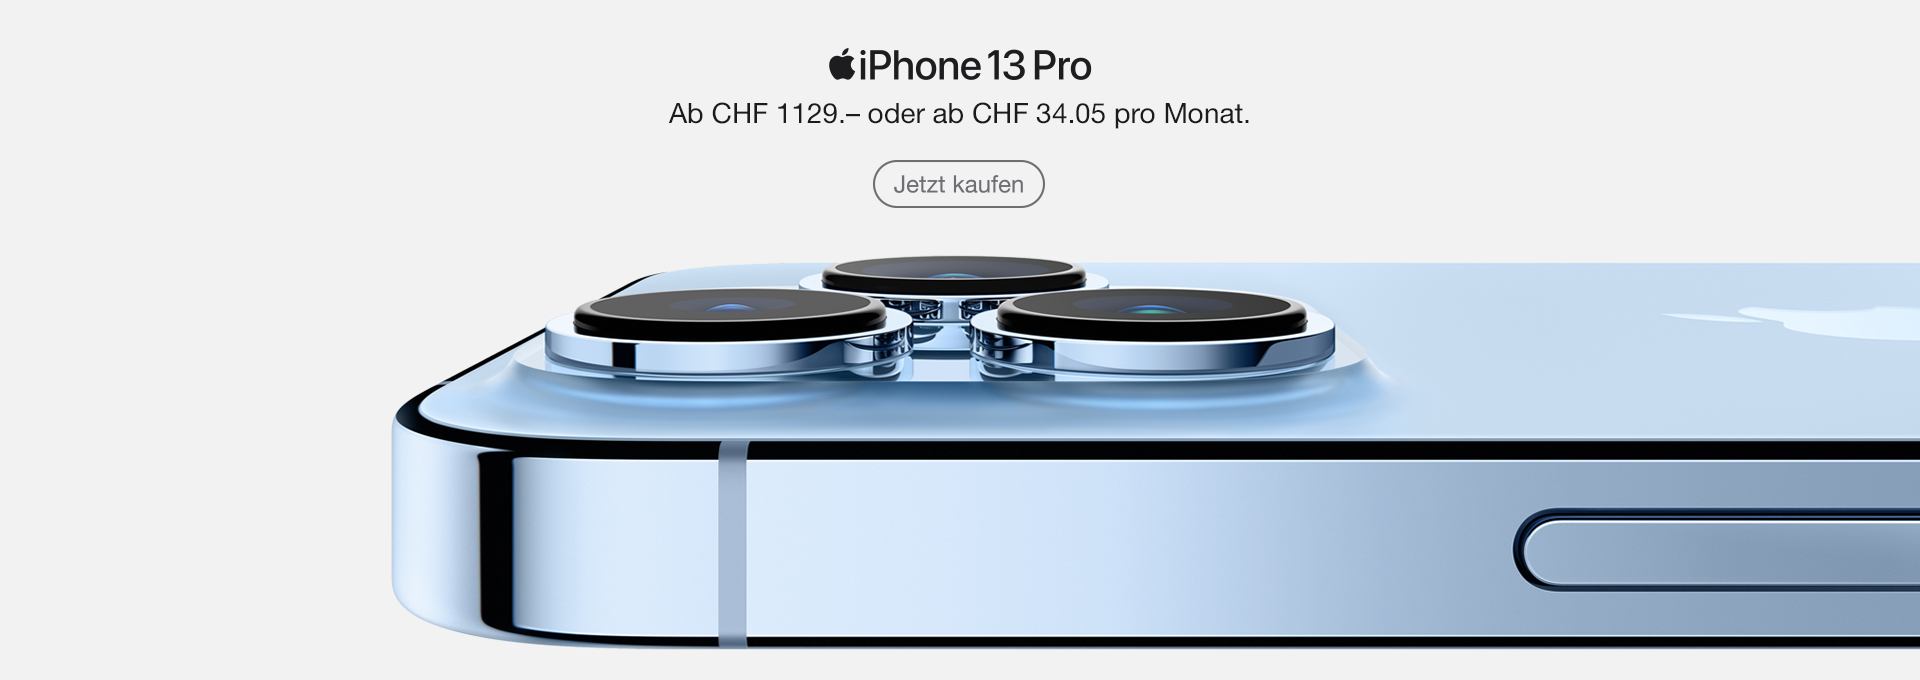 iPhone 13 Pro /iPhone 13 Pro Max